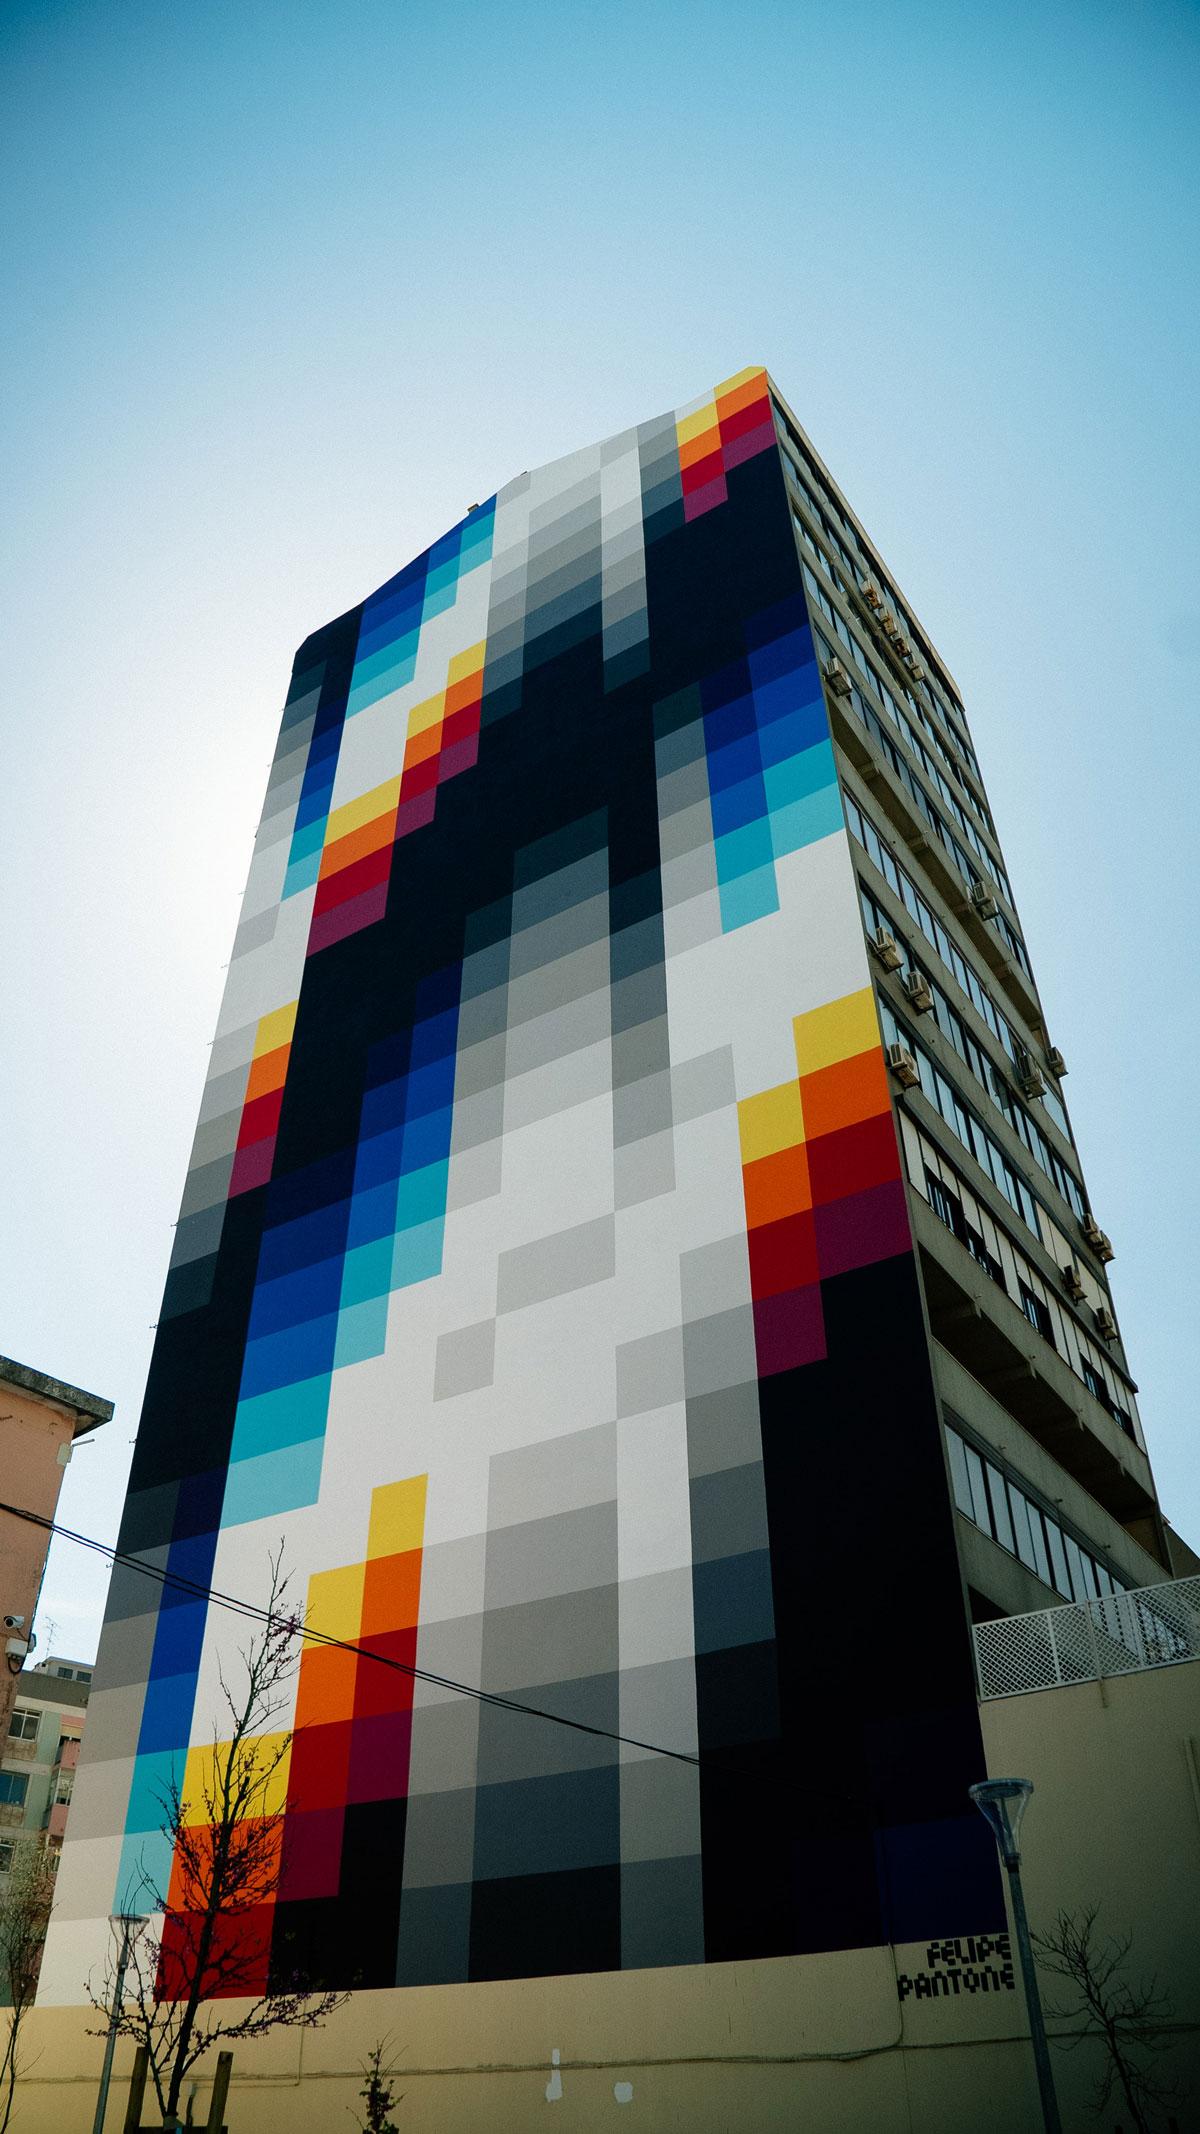 flipe-pantone-lisbon-mural-urbanshit-9